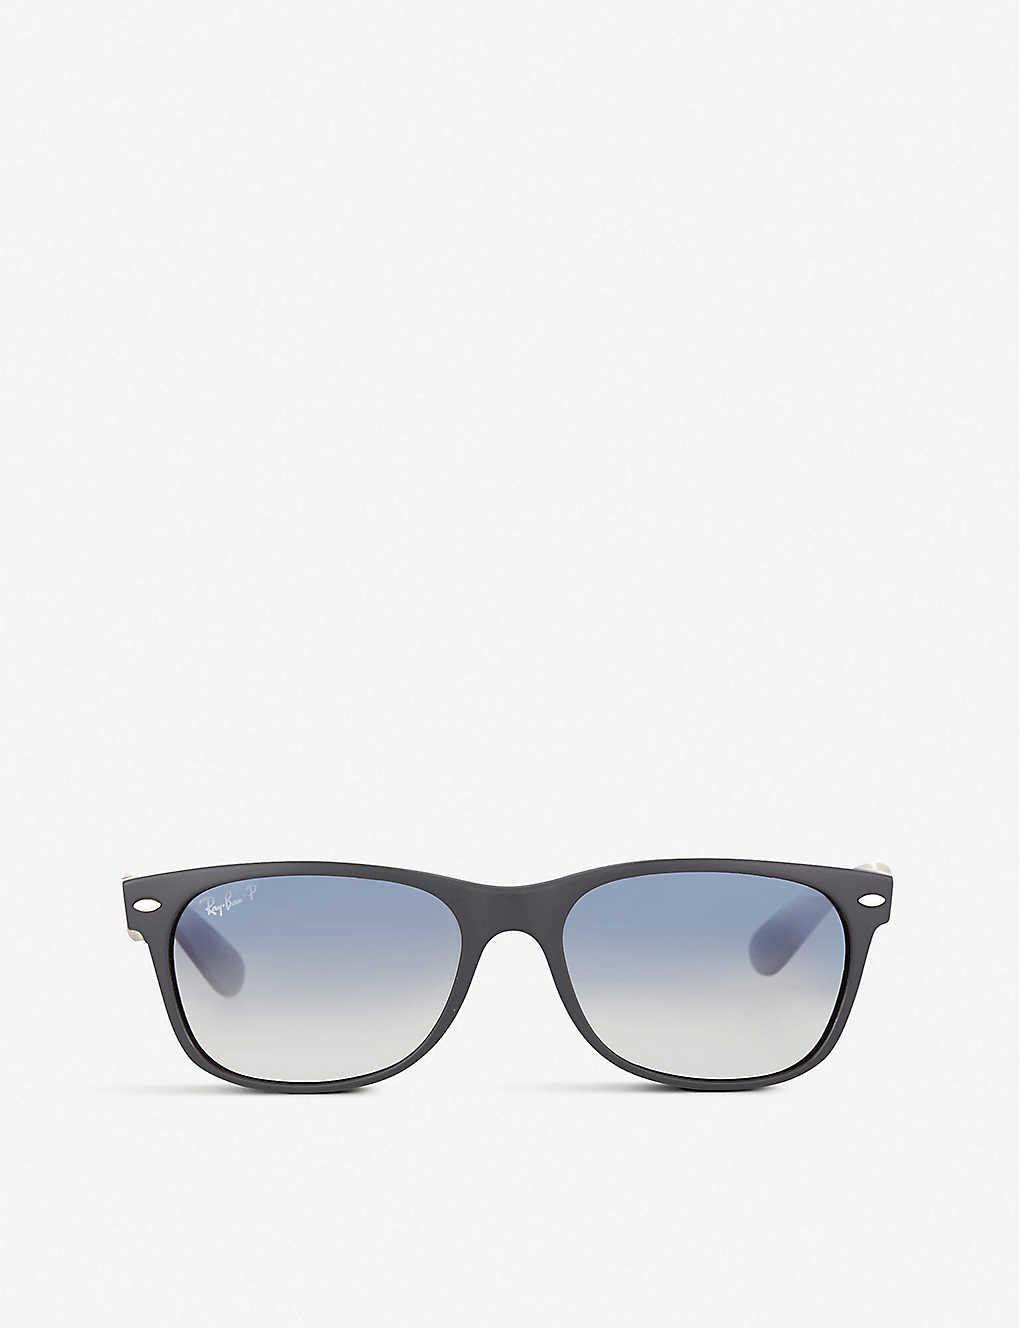 82cb9499aa1 RAY-BAN - RB3132 Wayfarer sunglasses